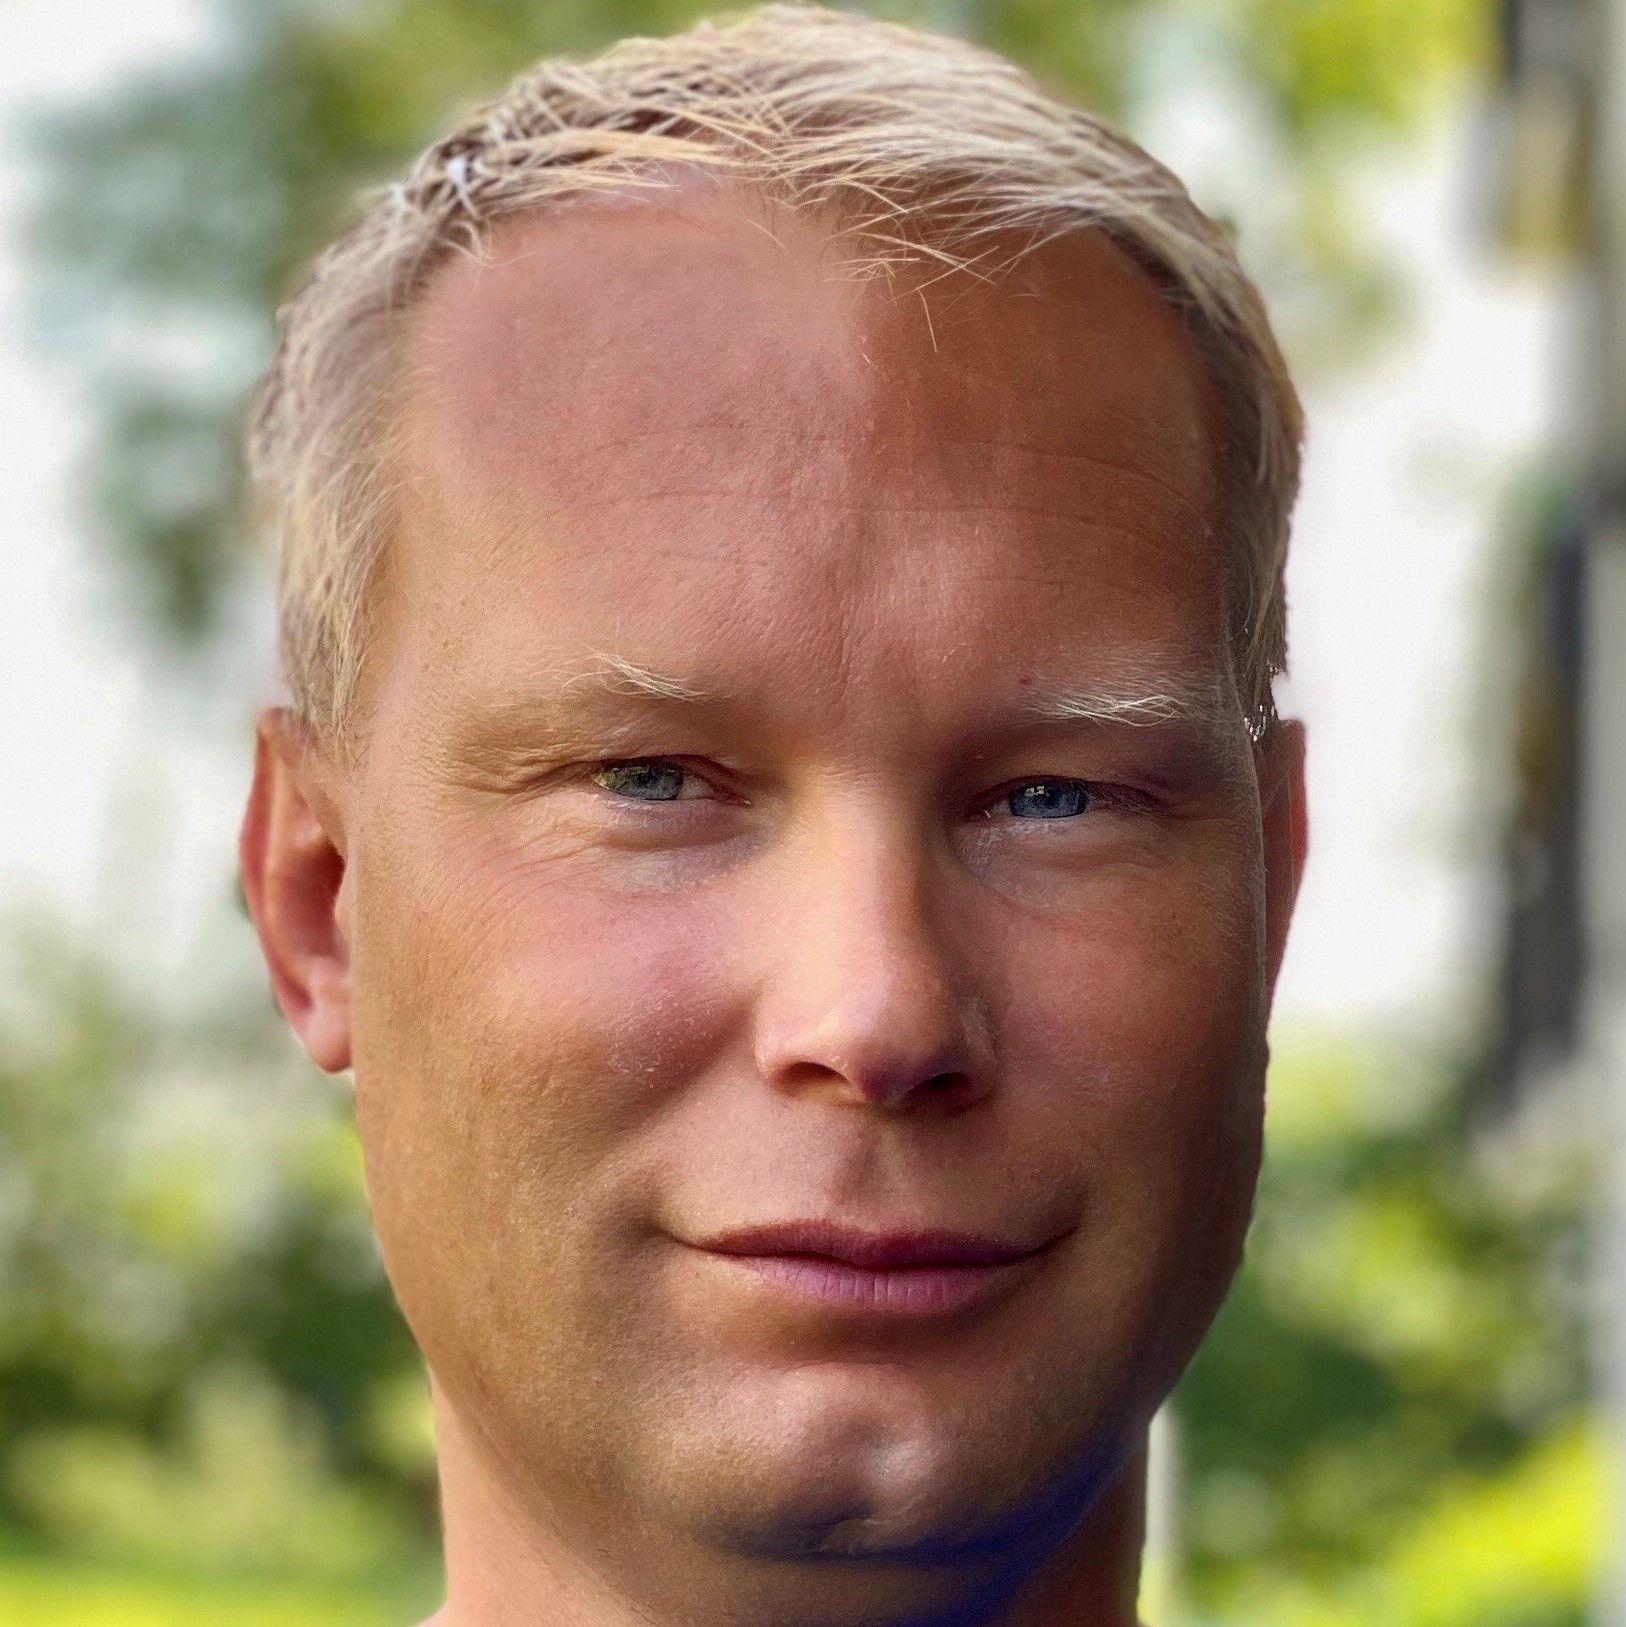 David Løvbræk